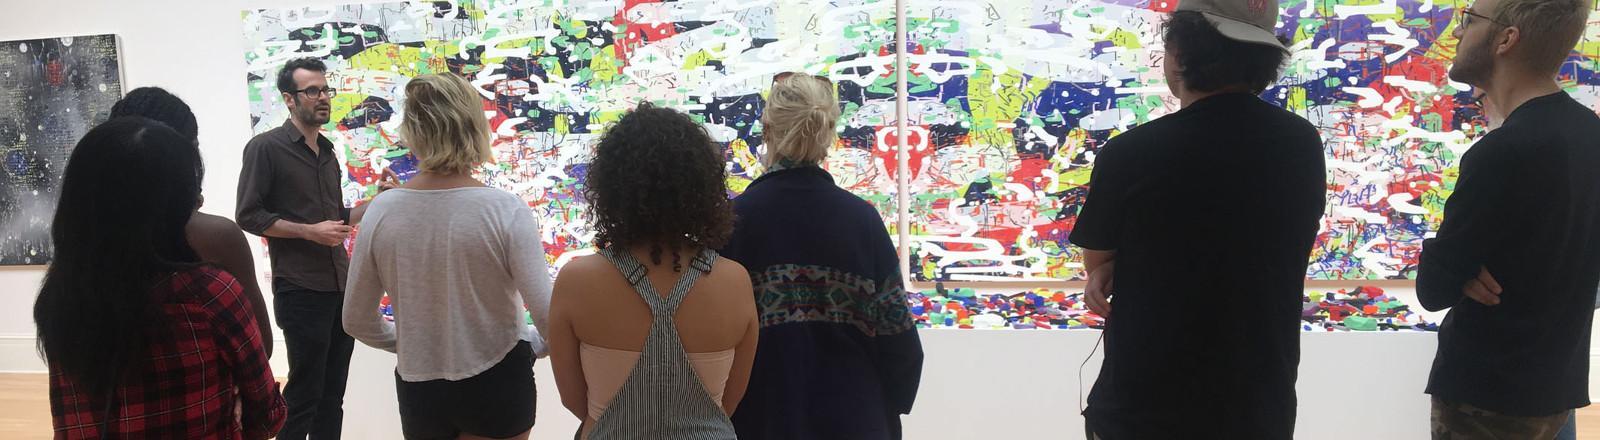 Loyola art students listen to a gallery talk.